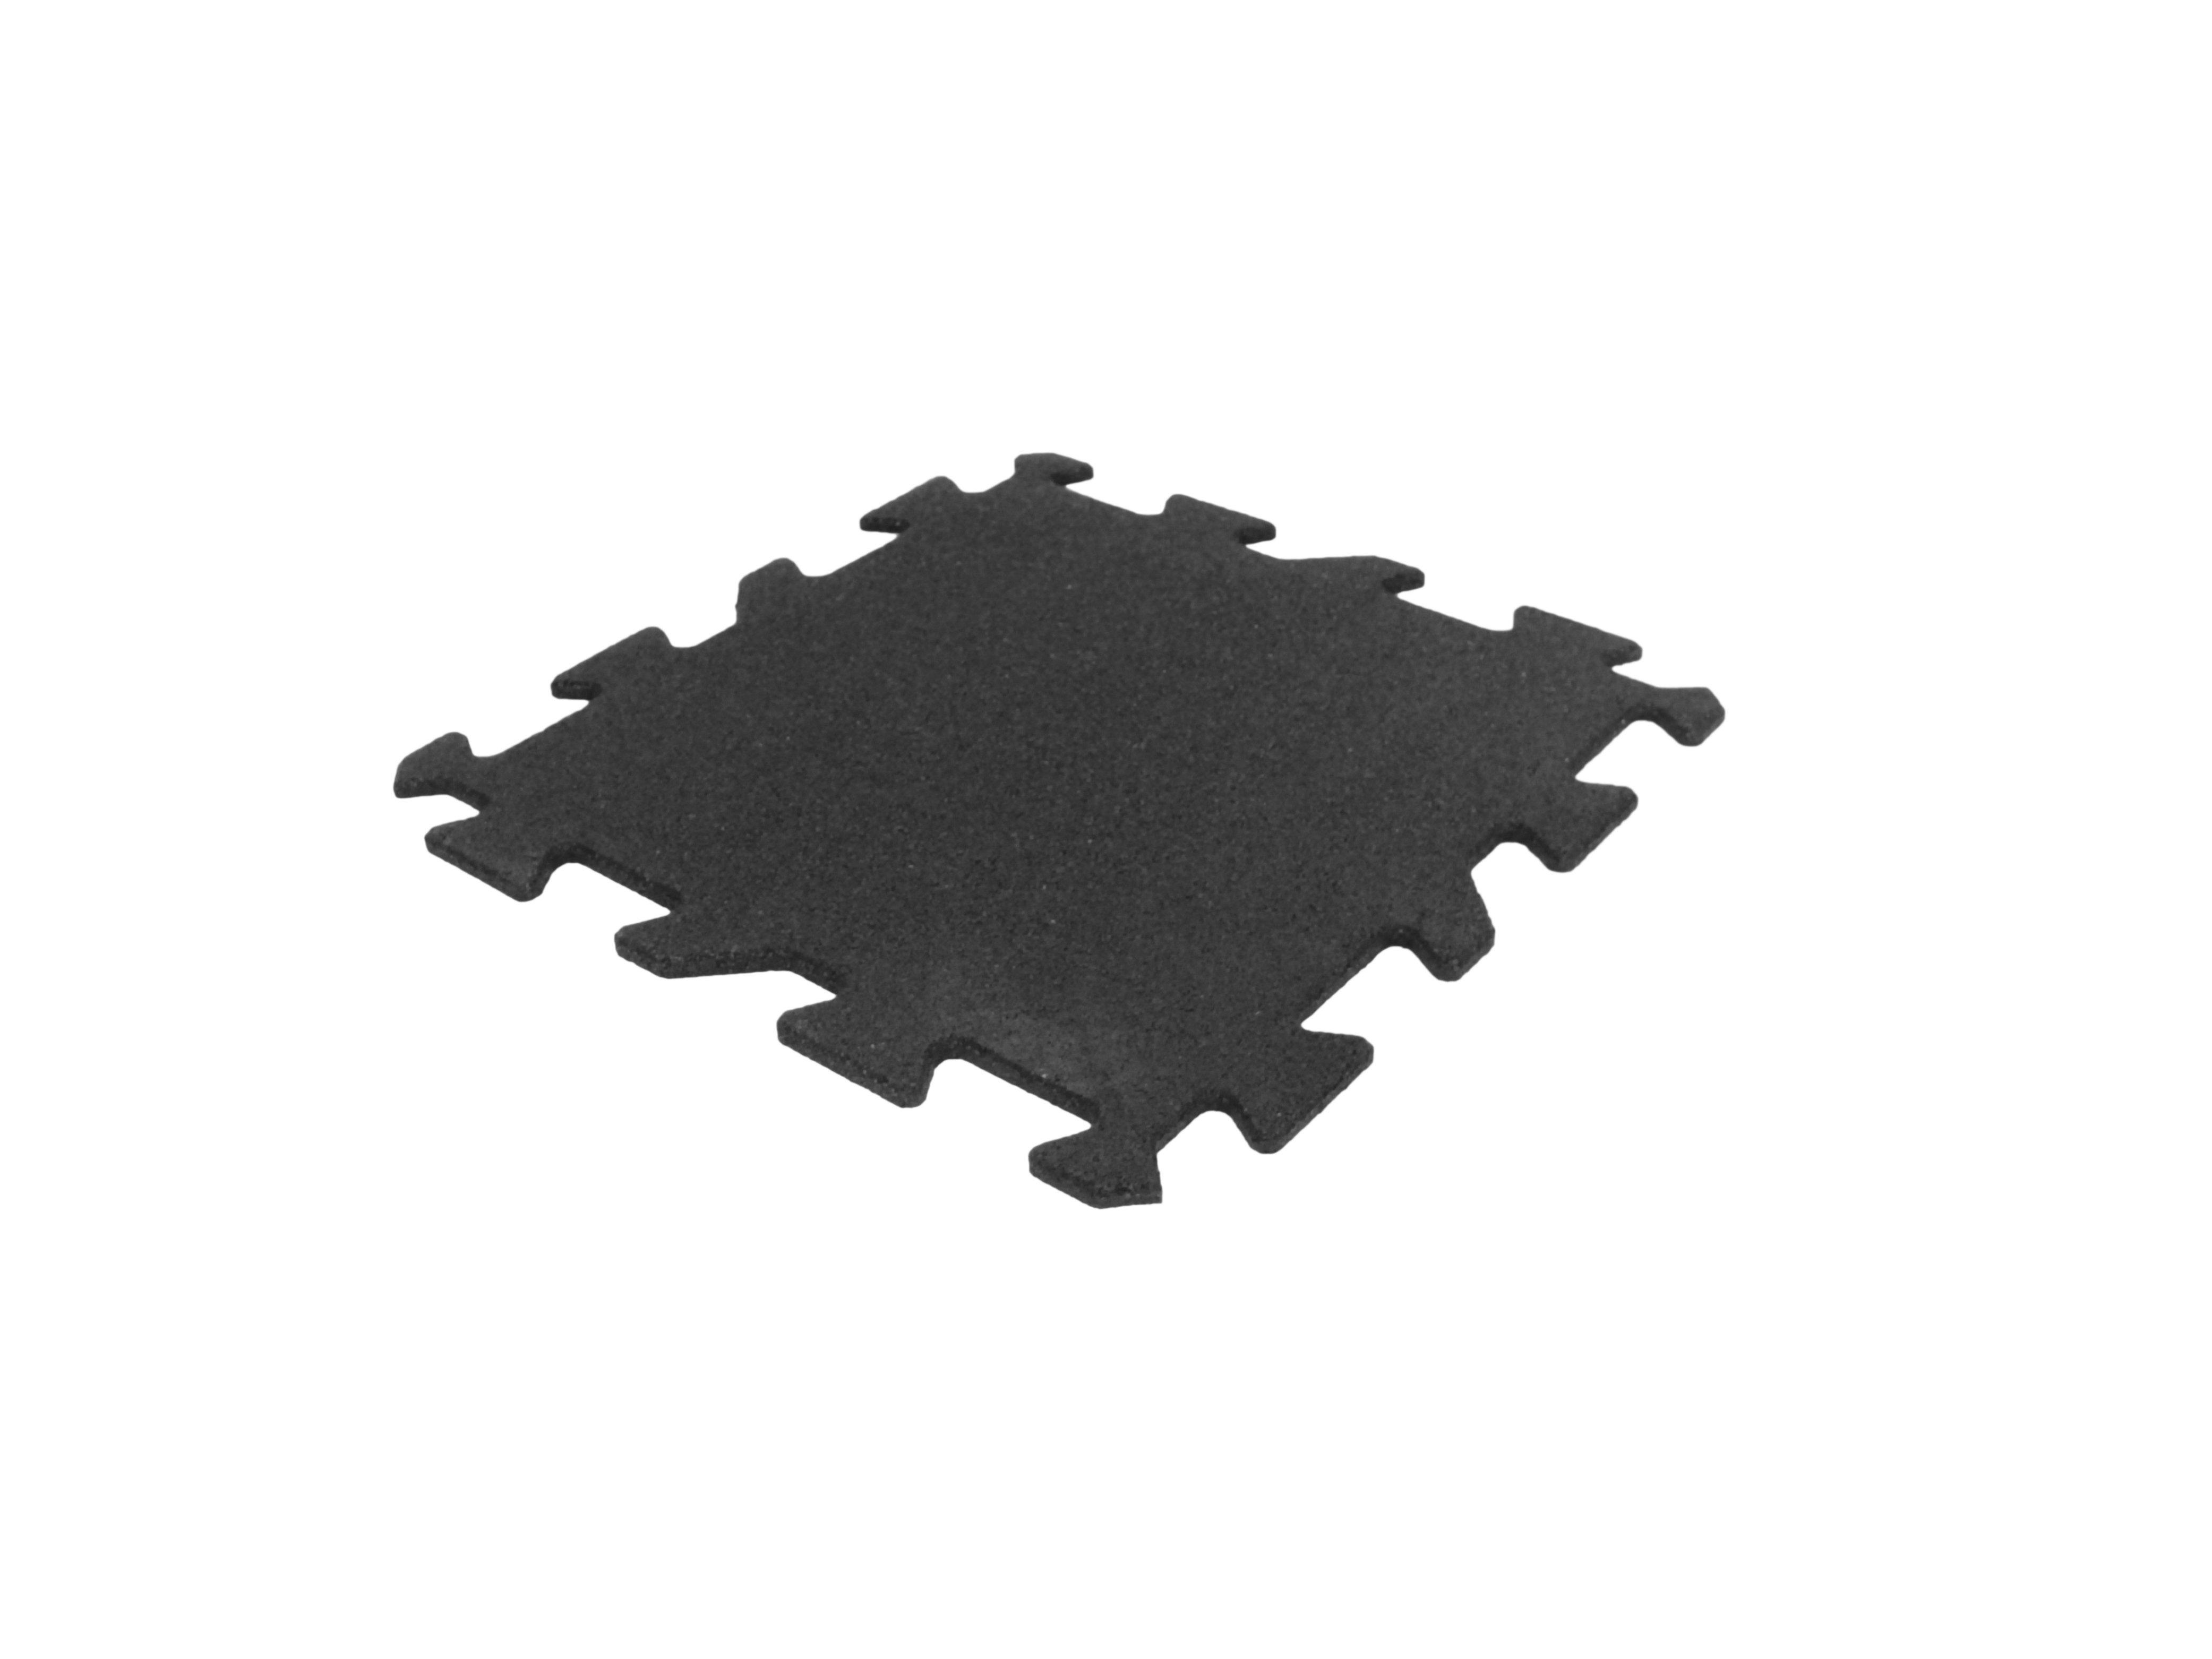 Lifemaxx ECO Puzzle Gummiflise 50 x 50 x 1 cm